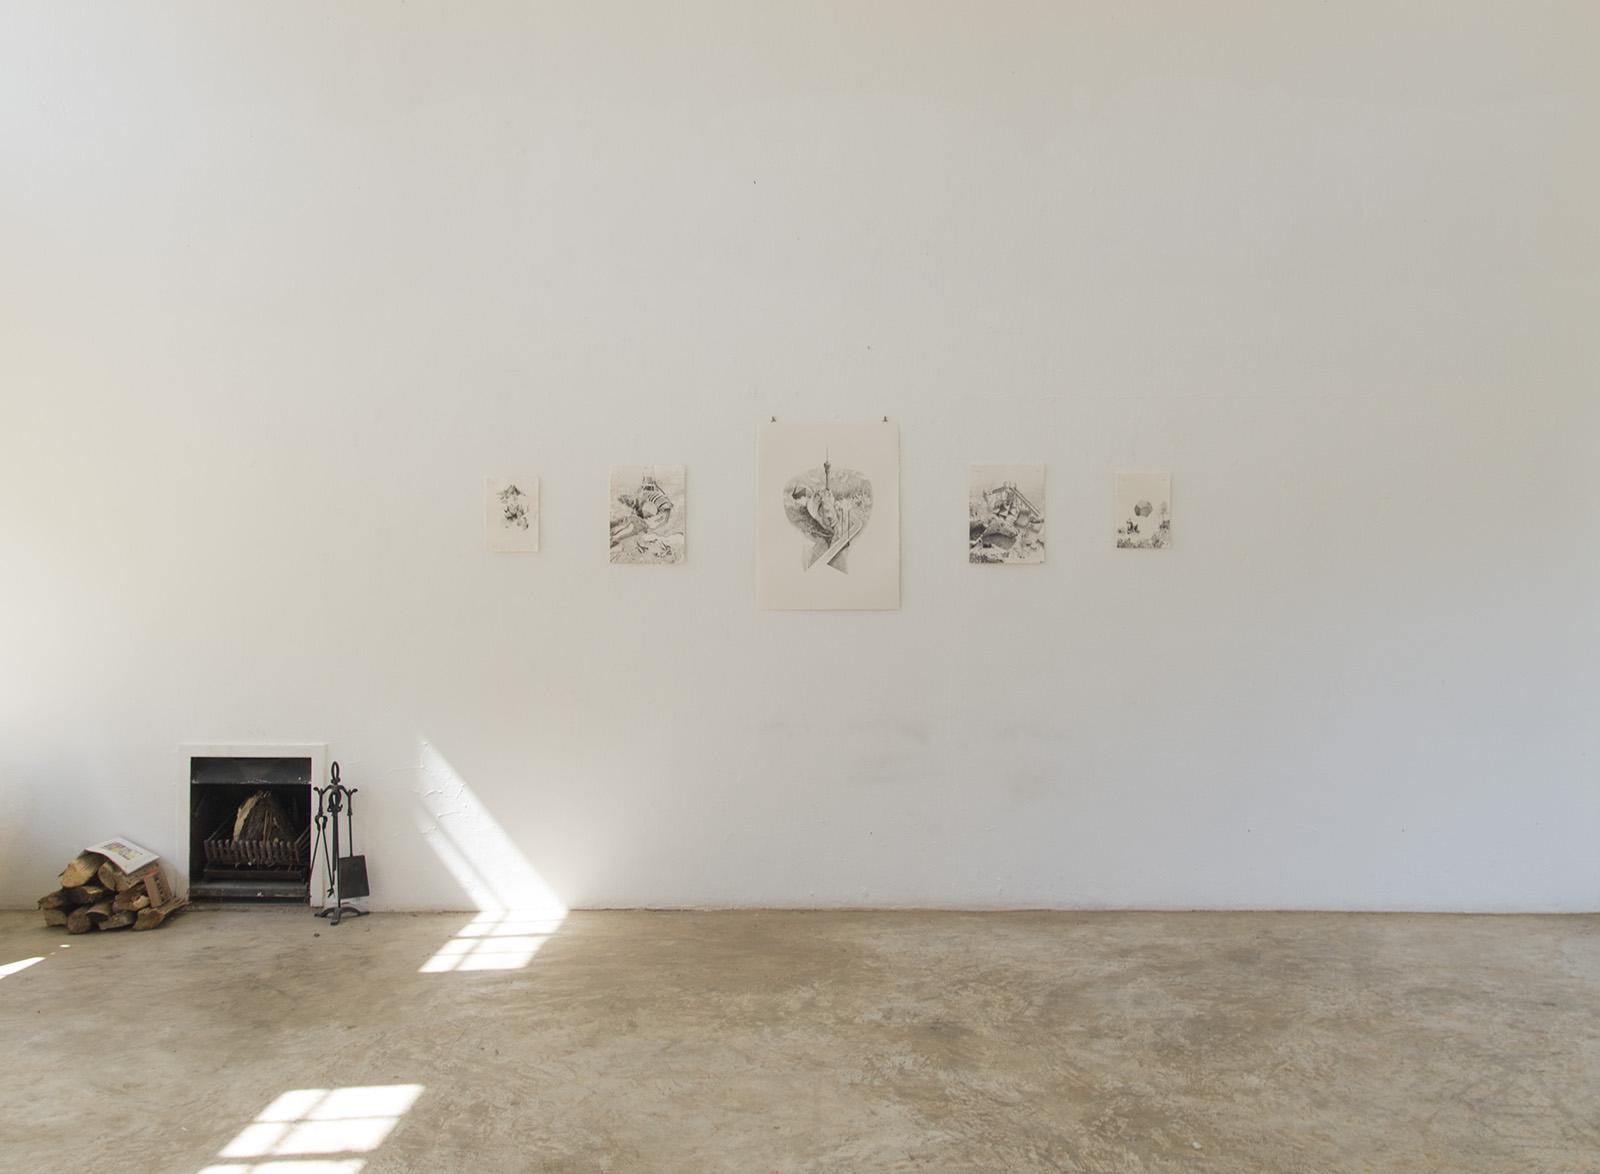 Vista del estudio en Nirox Arts